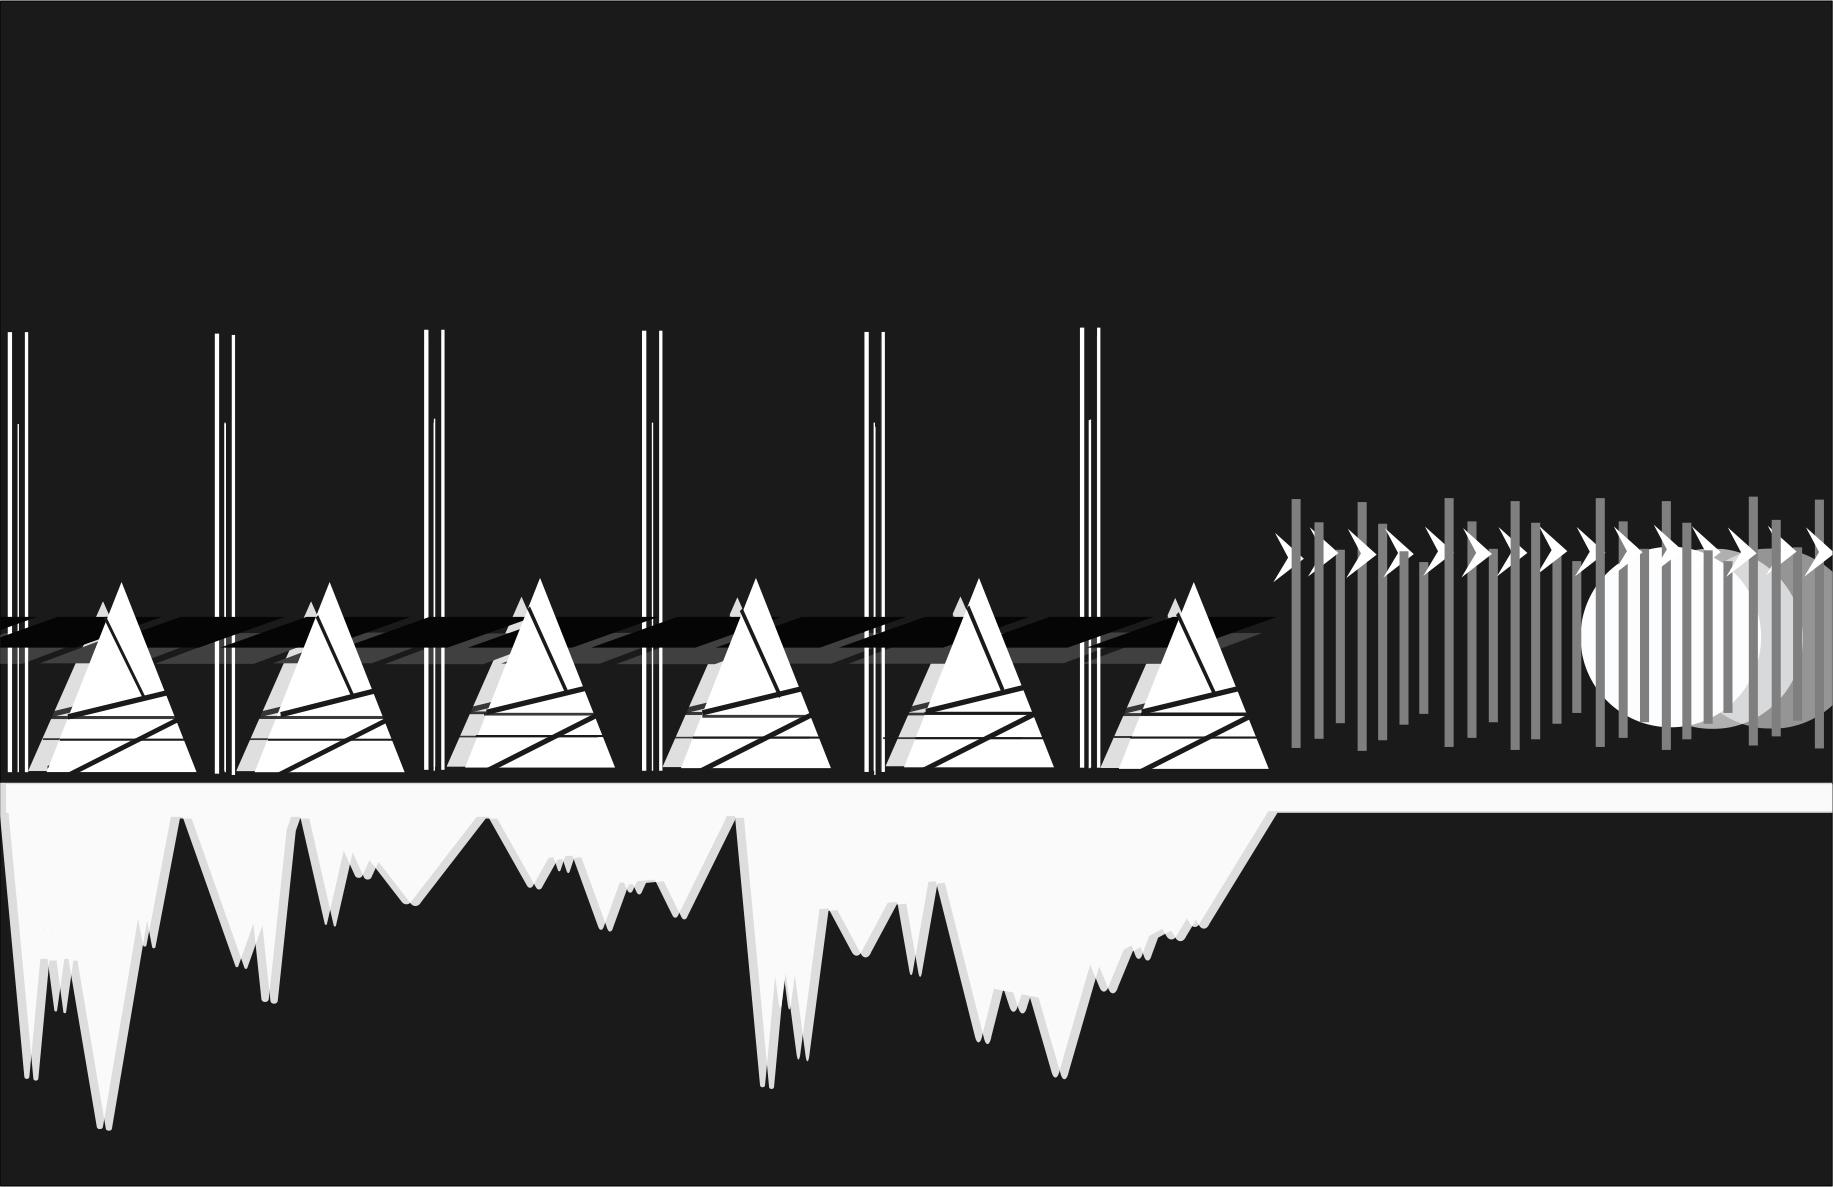 ART215 Illustrator/InDesign - Interpreting Music as Geometric Patterns: Sami Shinn